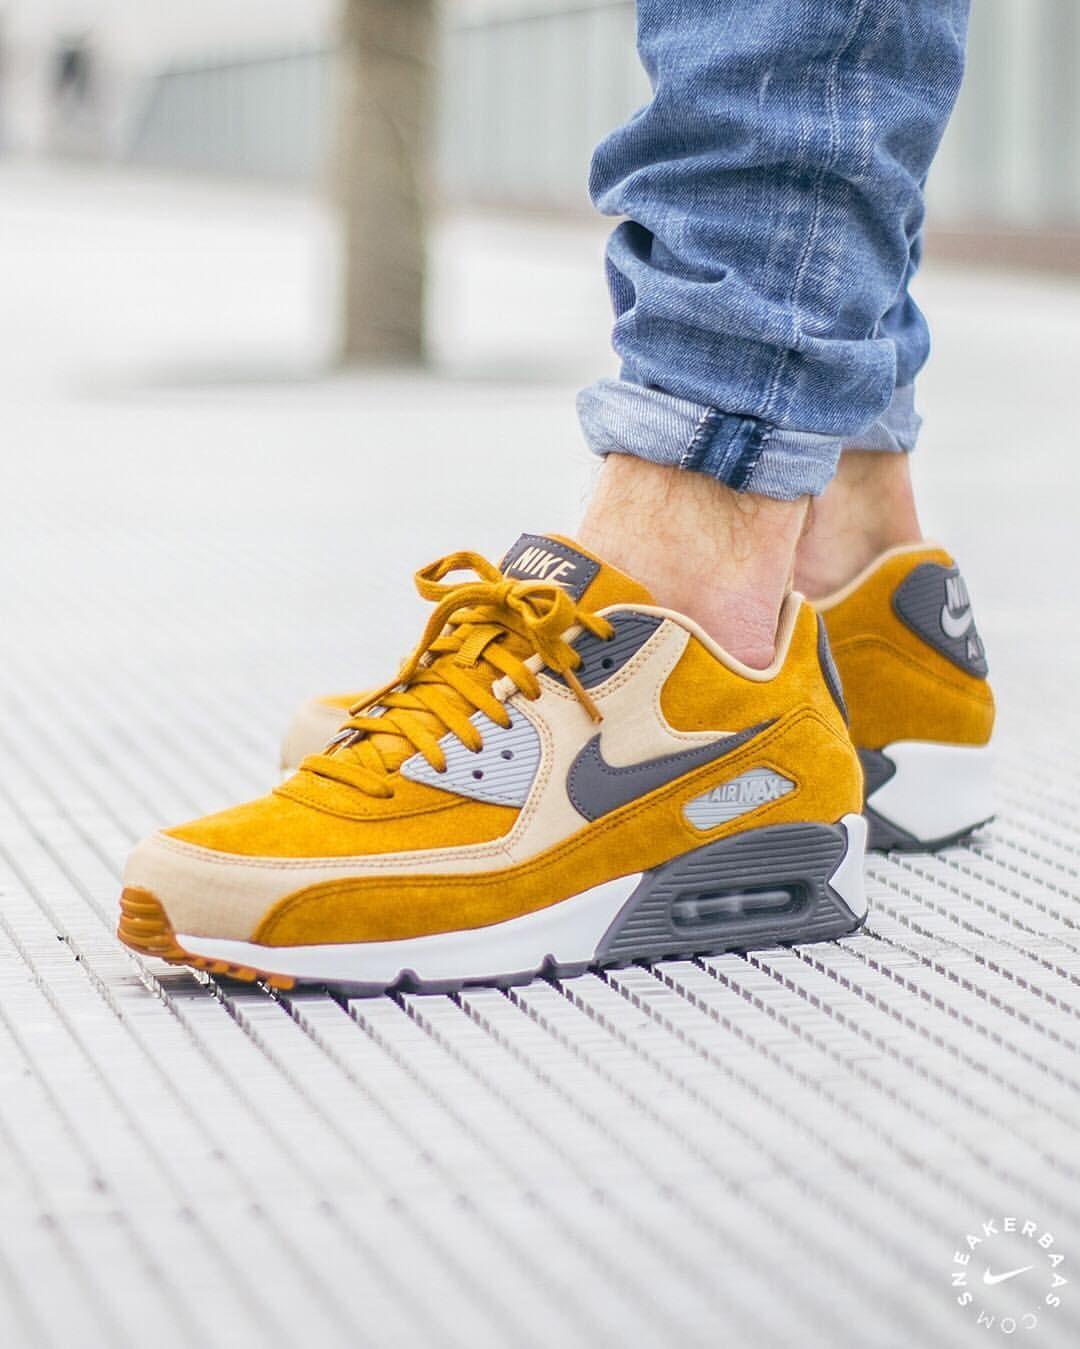 sports shoes 97a22 e2c3d Nike Air Max 90 Premium Desert Ochre  sneakers  sneakernews  StreetStyle   Kicks  adidas  nike  vans  newbalance  puma  ADIDAS  ASICS  CONVERSE   DIADORA ...